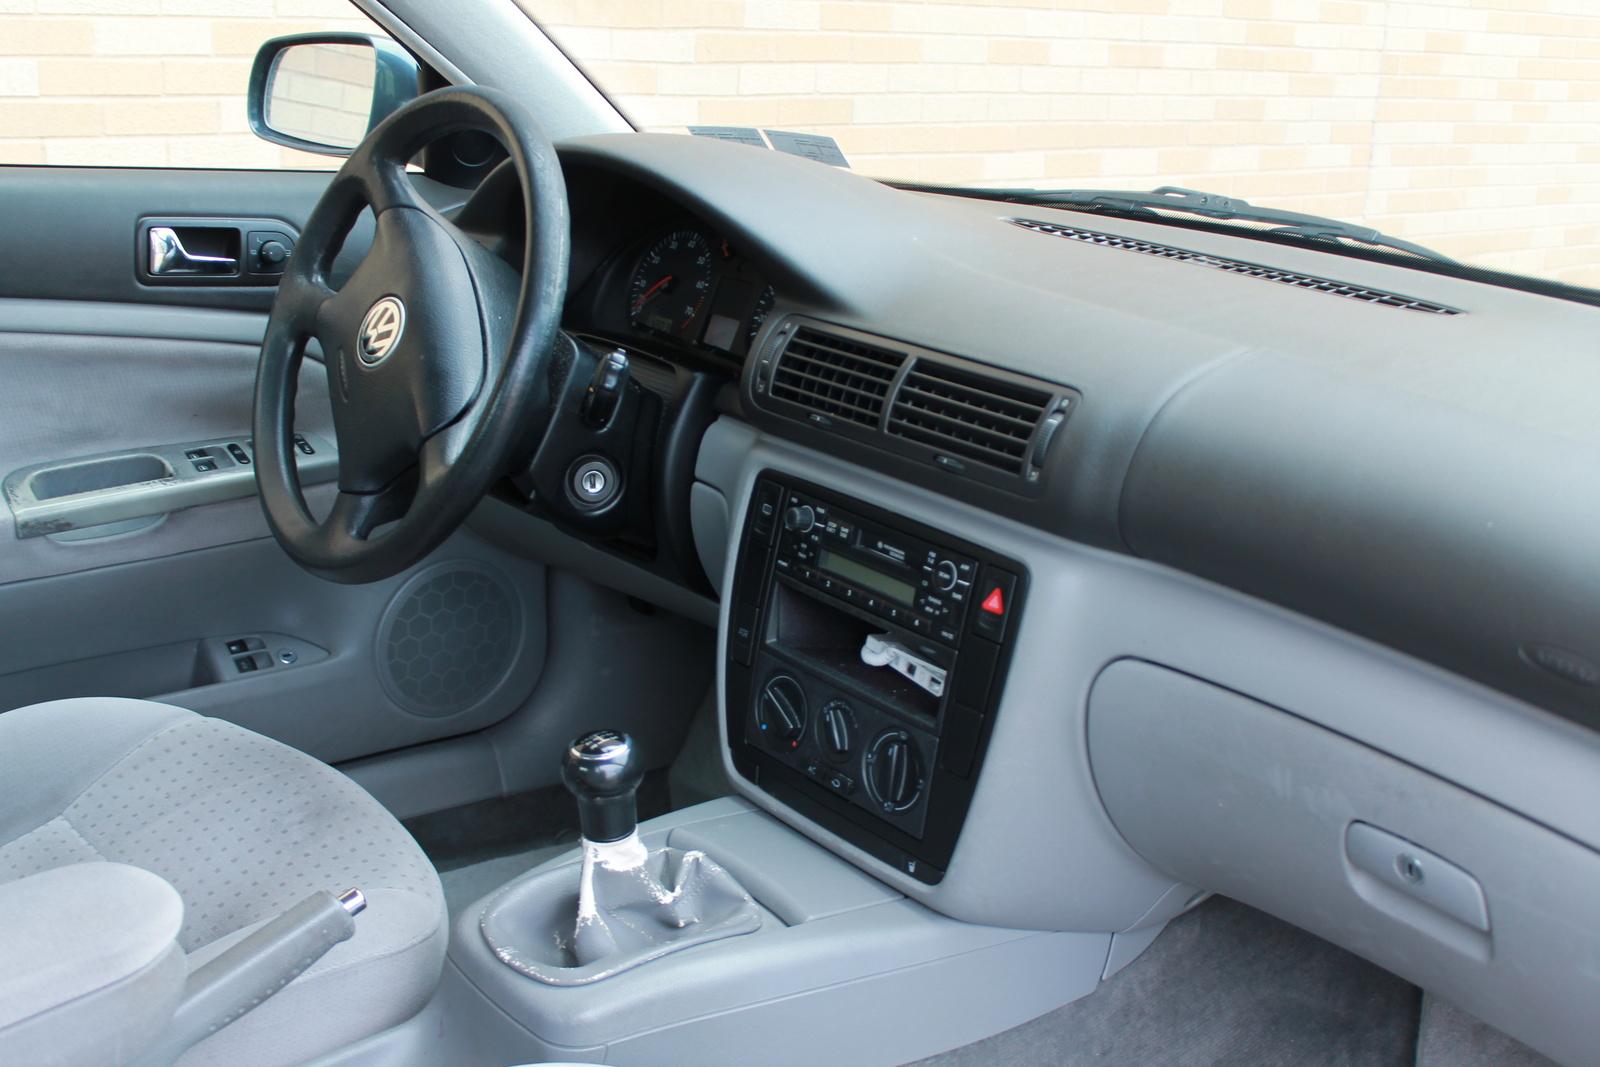 2000 Volkswagen Passat Pictures Cargurus Make Your Own Beautiful  HD Wallpapers, Images Over 1000+ [ralydesign.ml]